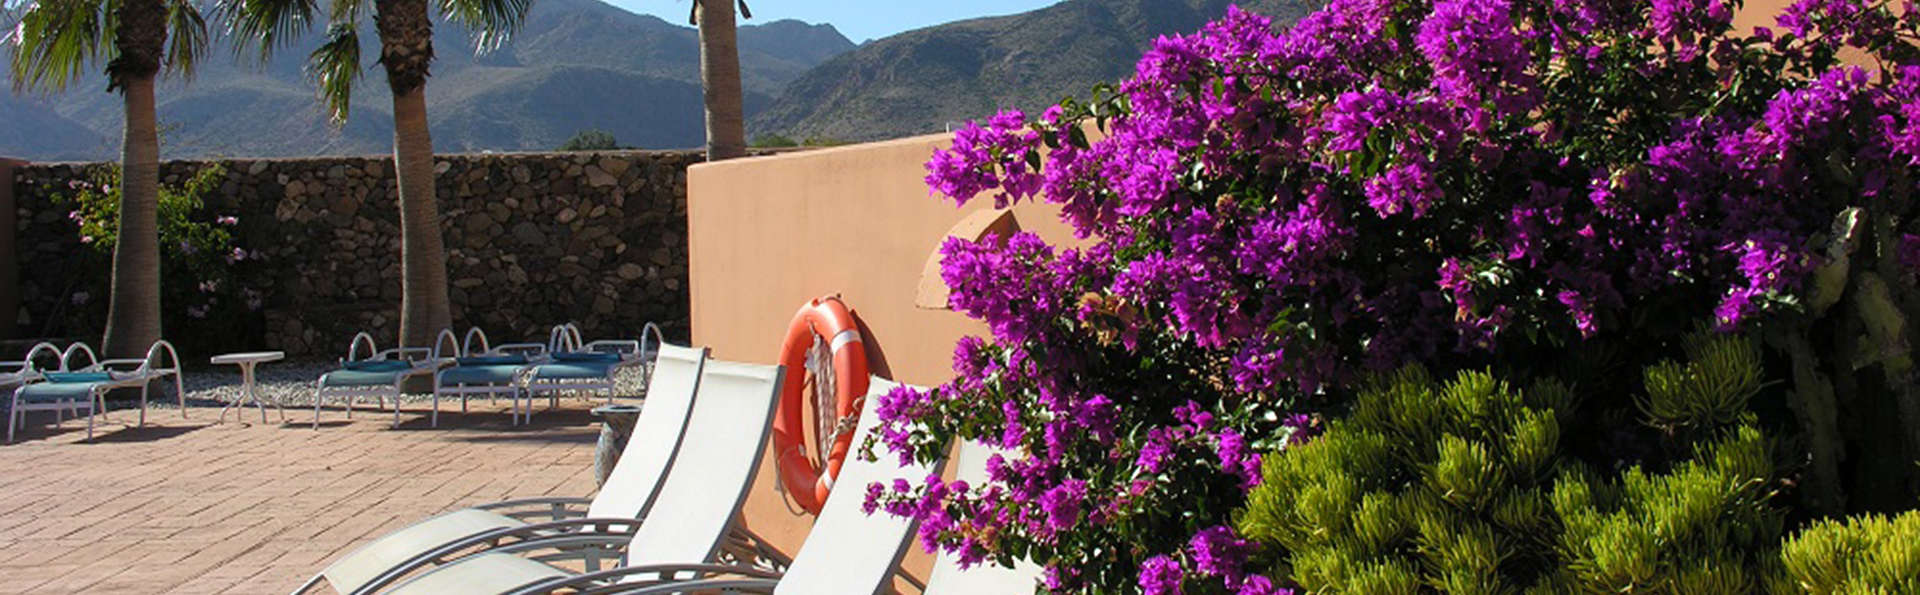 Hotel de Naturaleza Rodalquilar - edit_garden.jpg